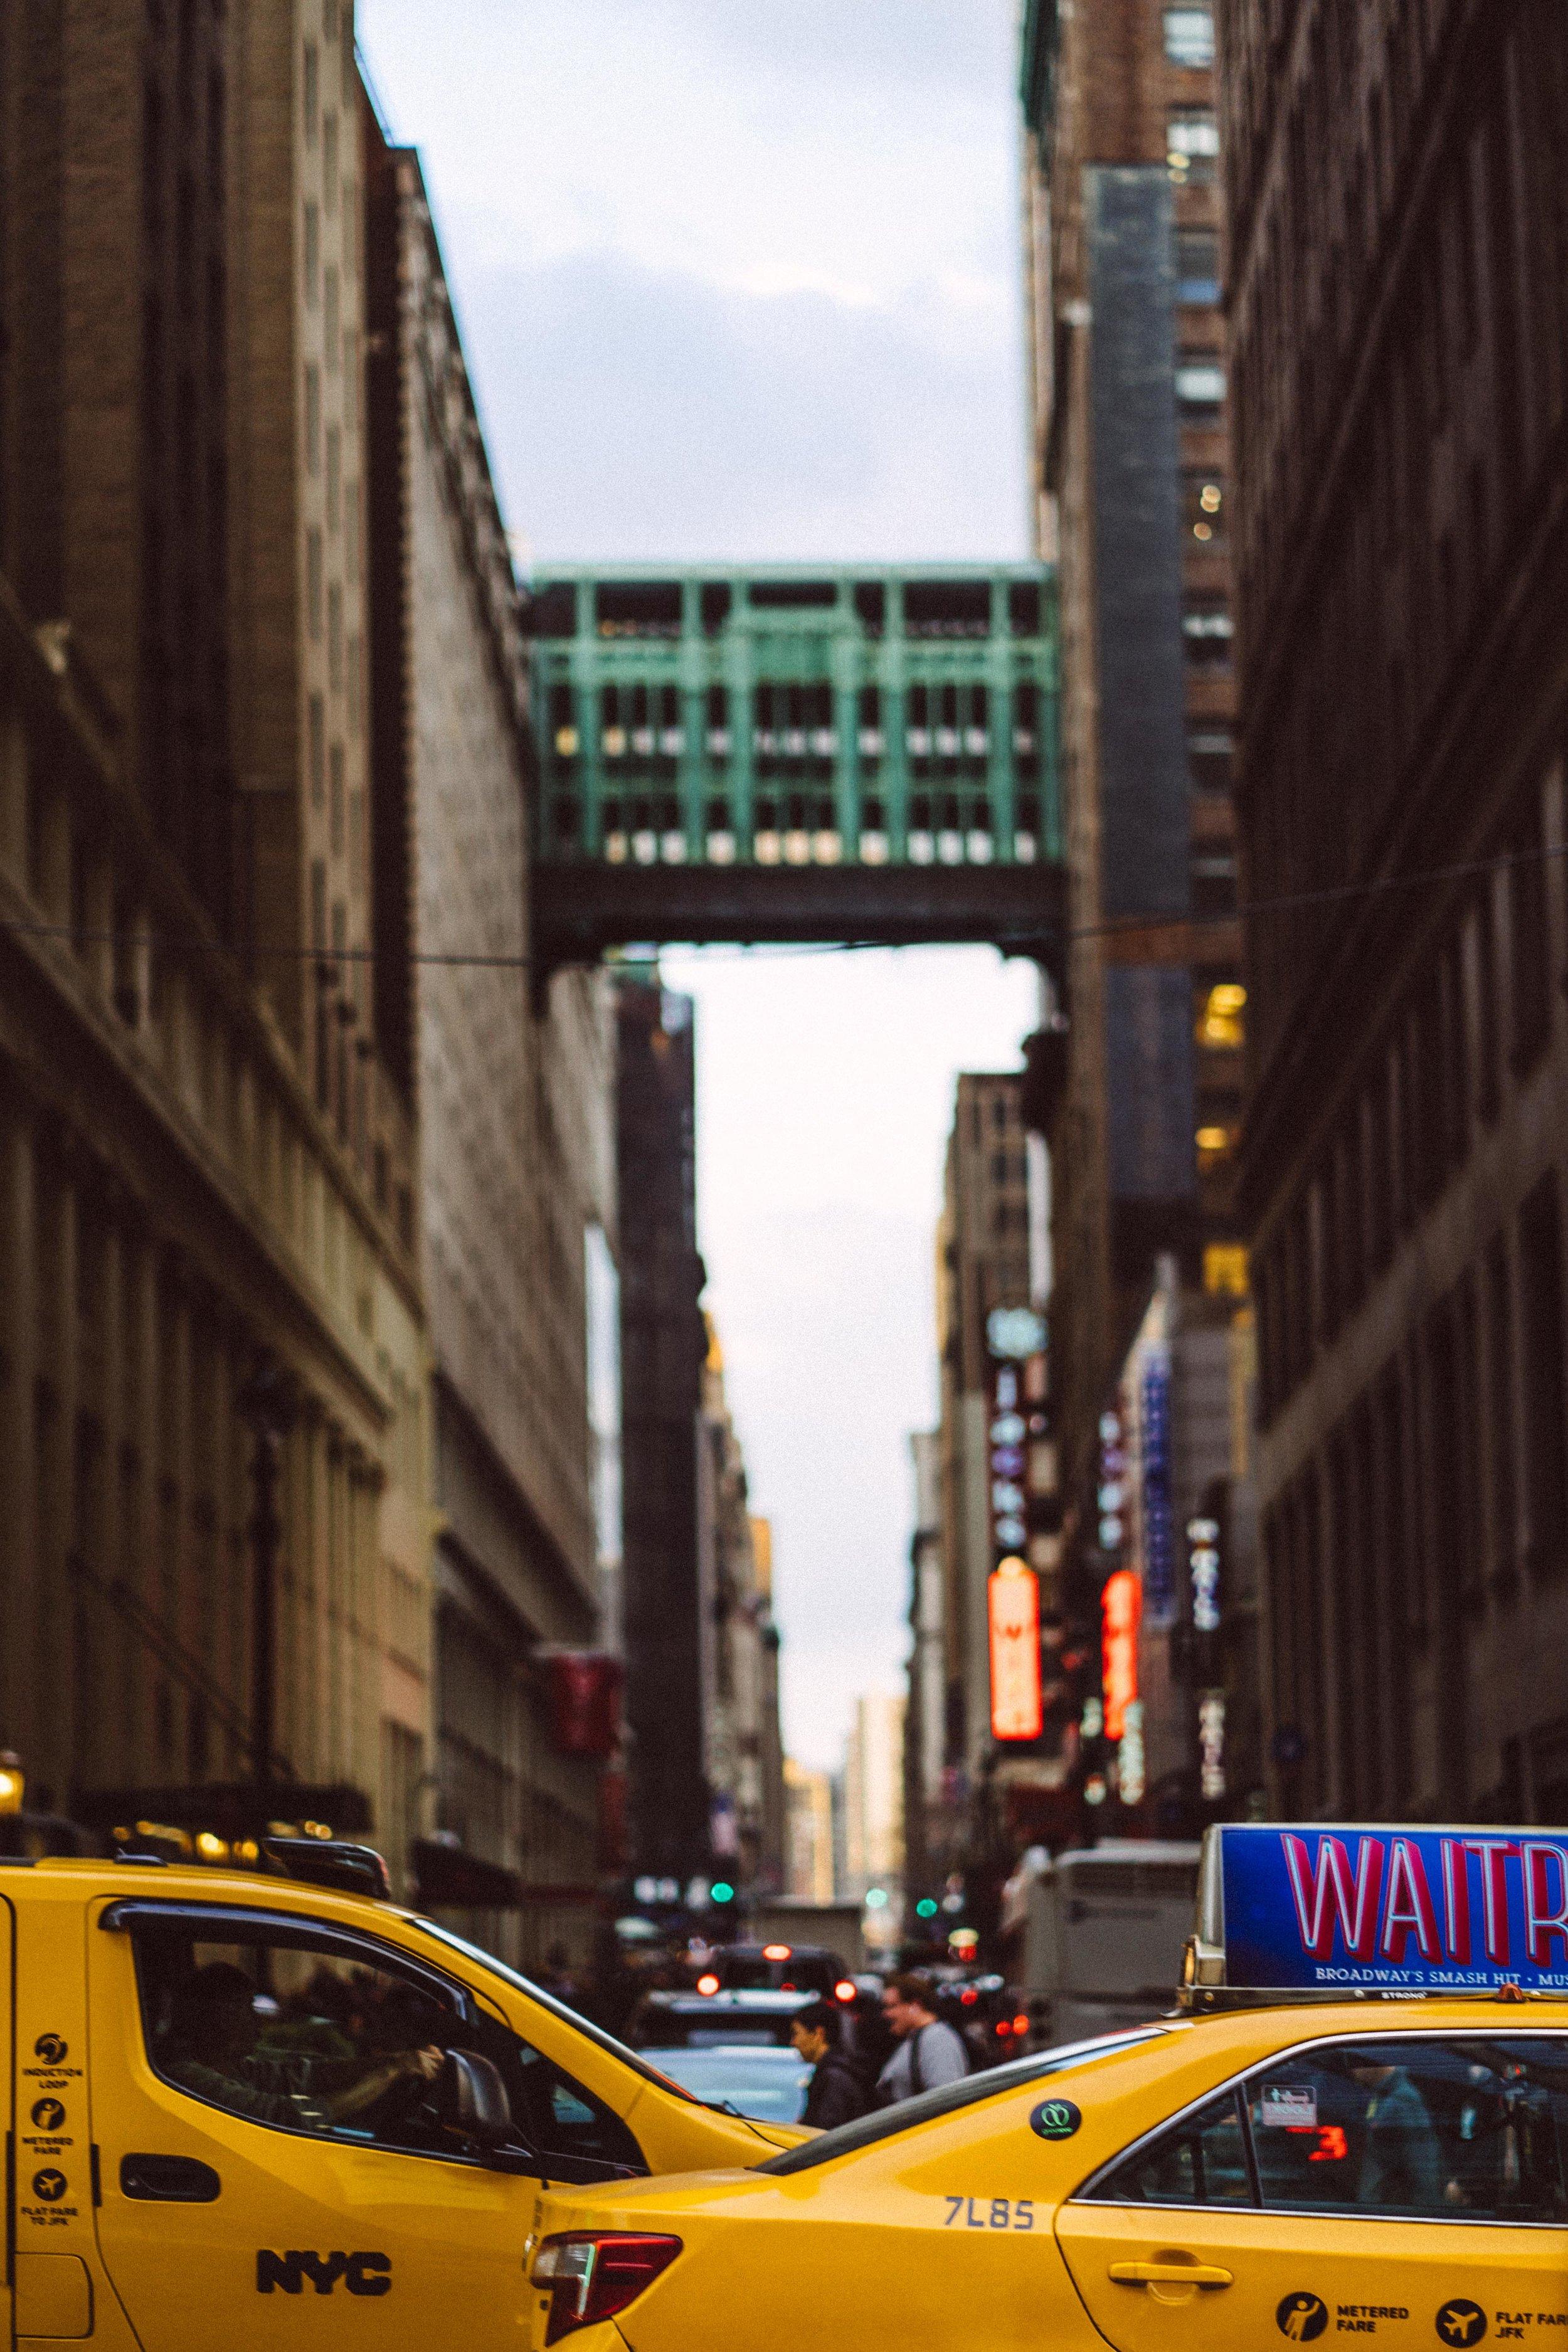 newyork-sony-102952.jpg